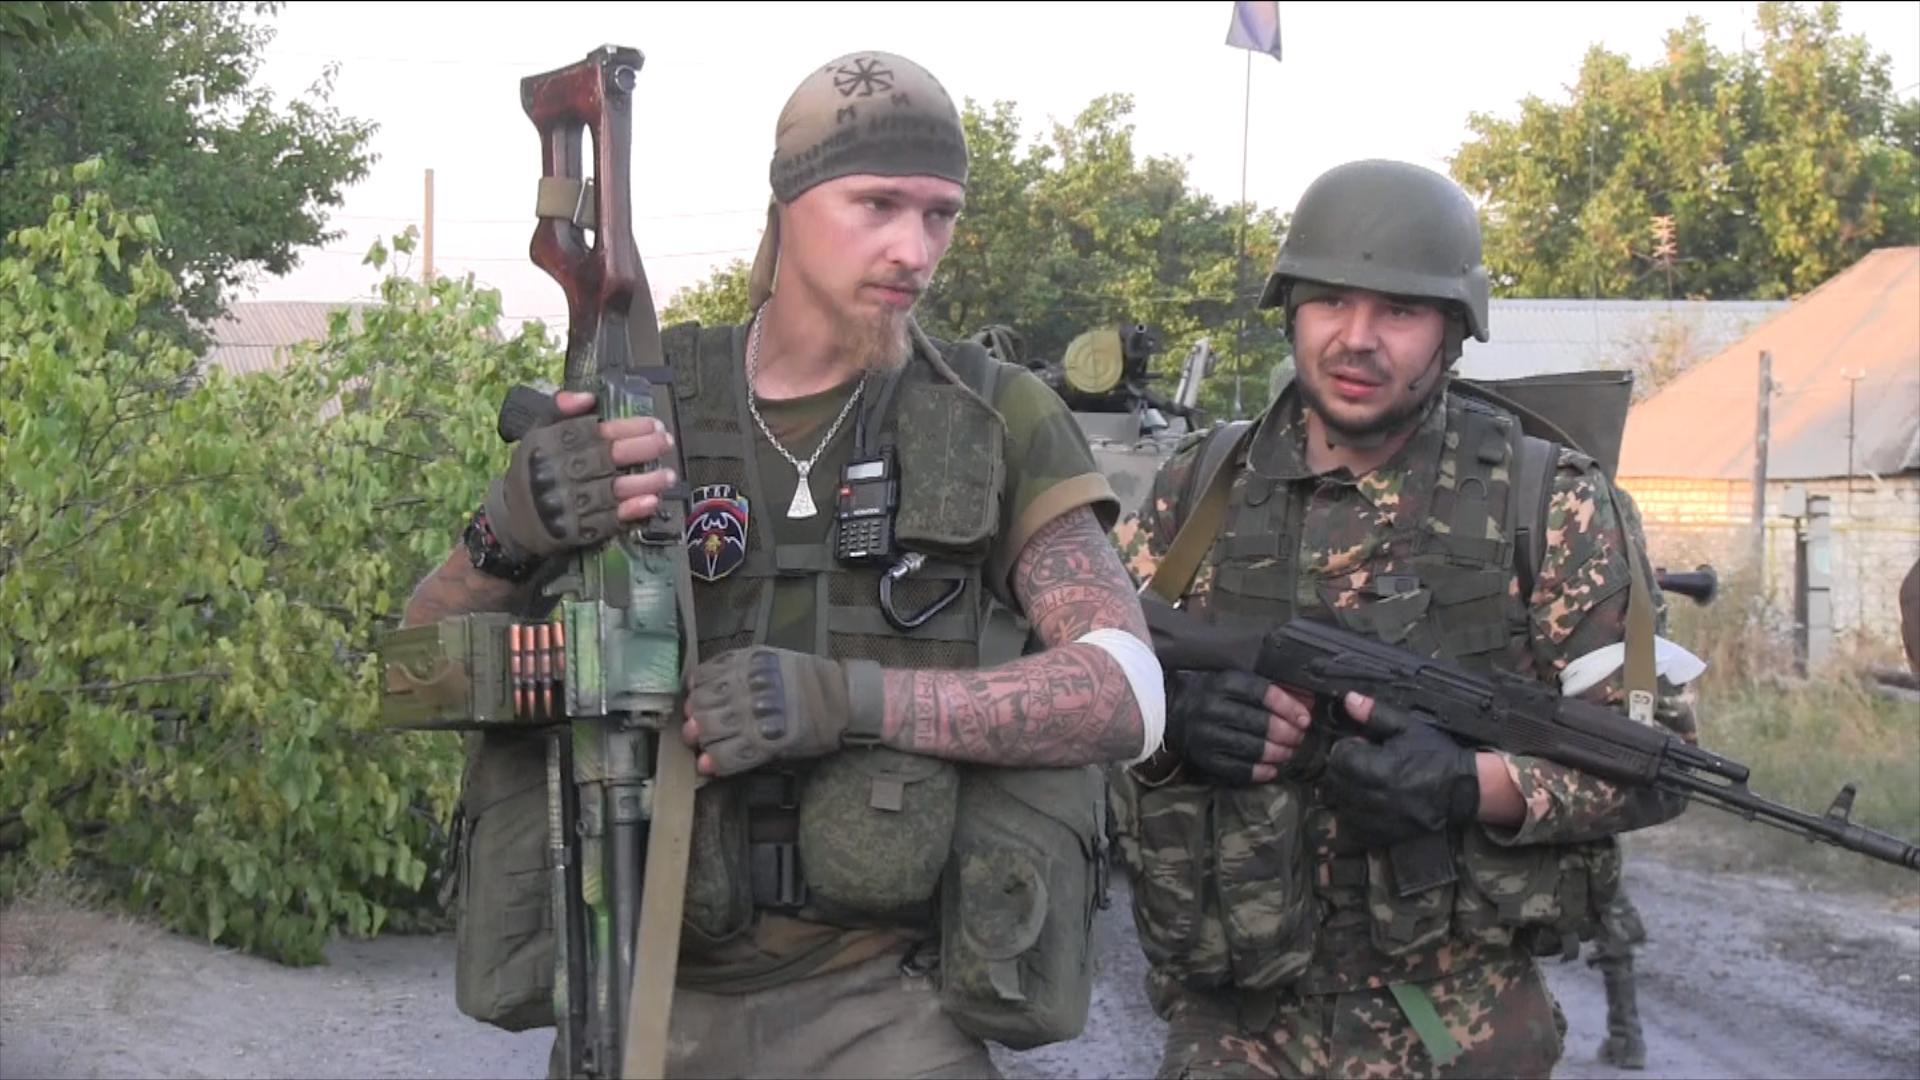 группа быстрого реагирования «Русич» 4-го батальона ЛНР «Бэтман»